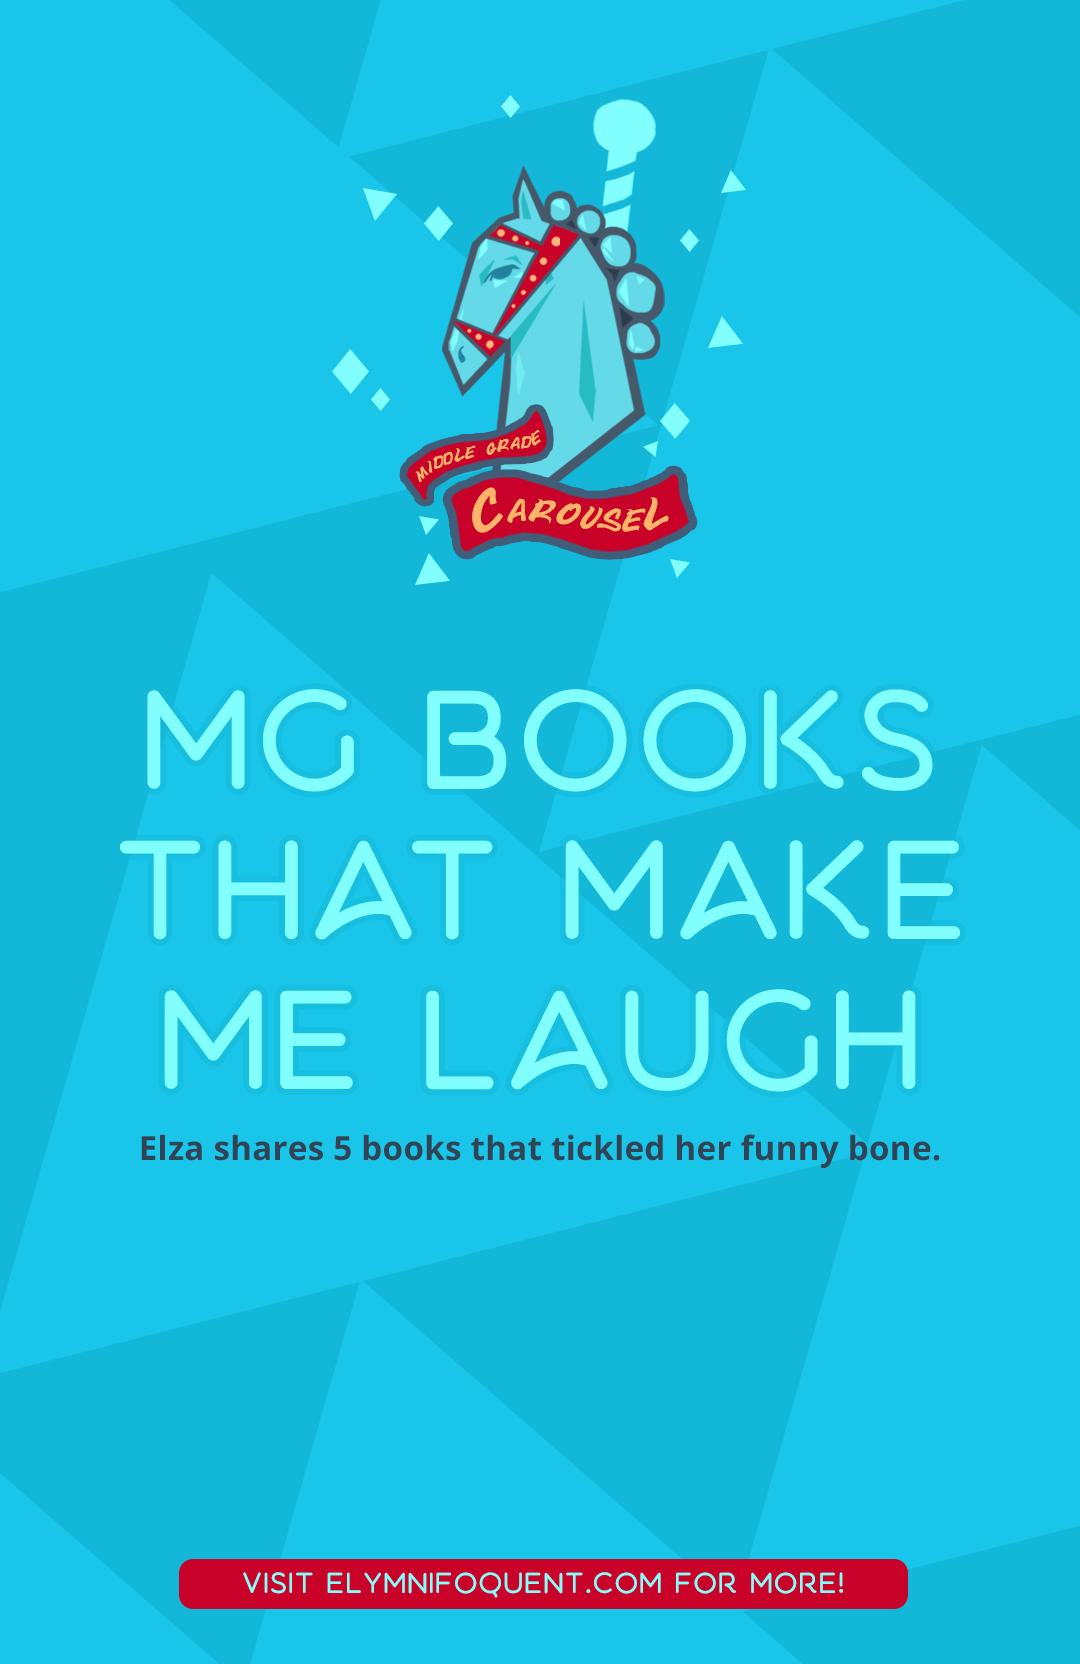 MG Books that Make Me Laugh